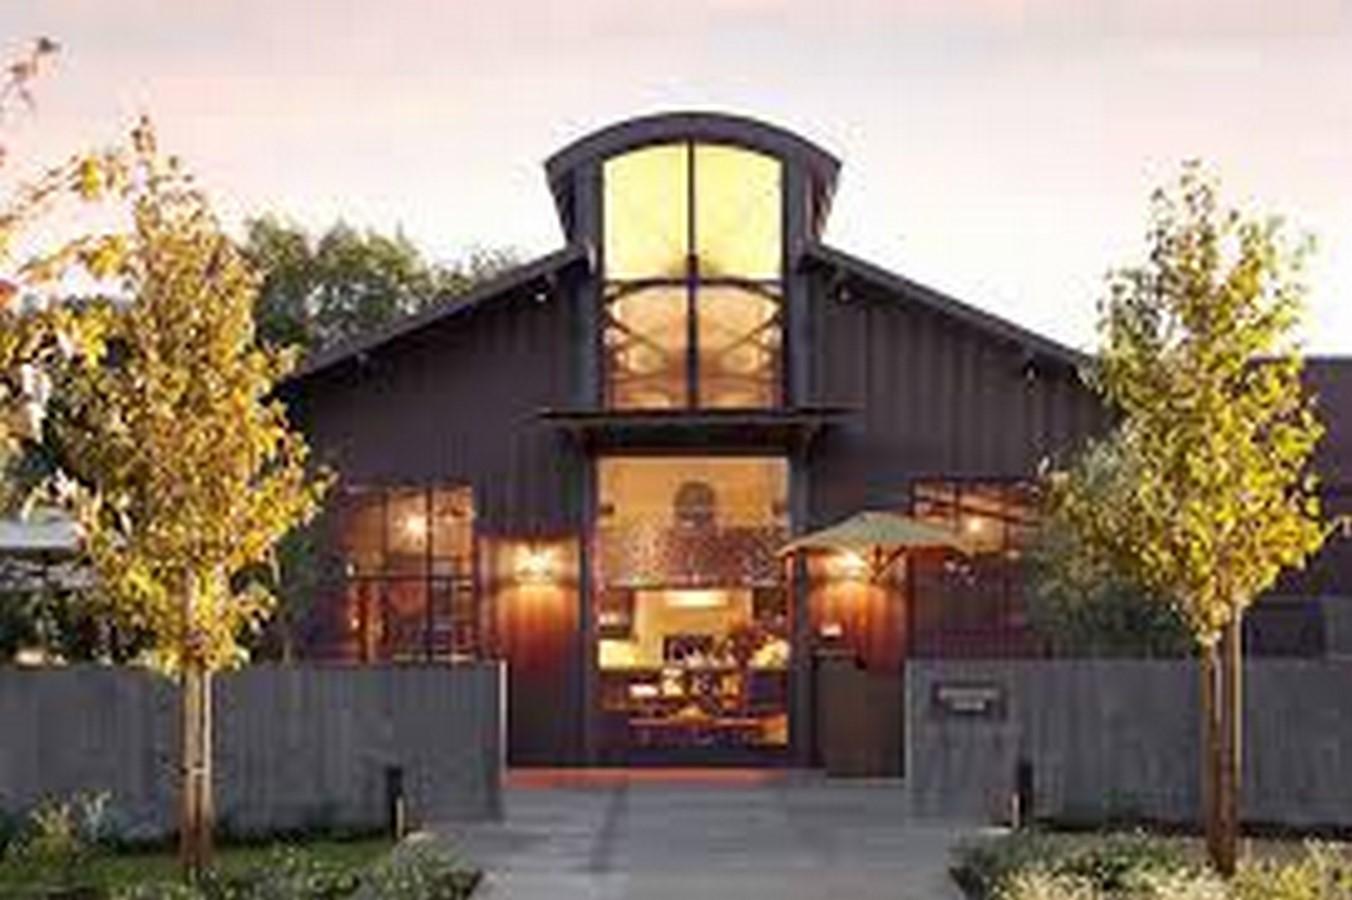 B Cellars vinery, Oakville, California - Sheet1